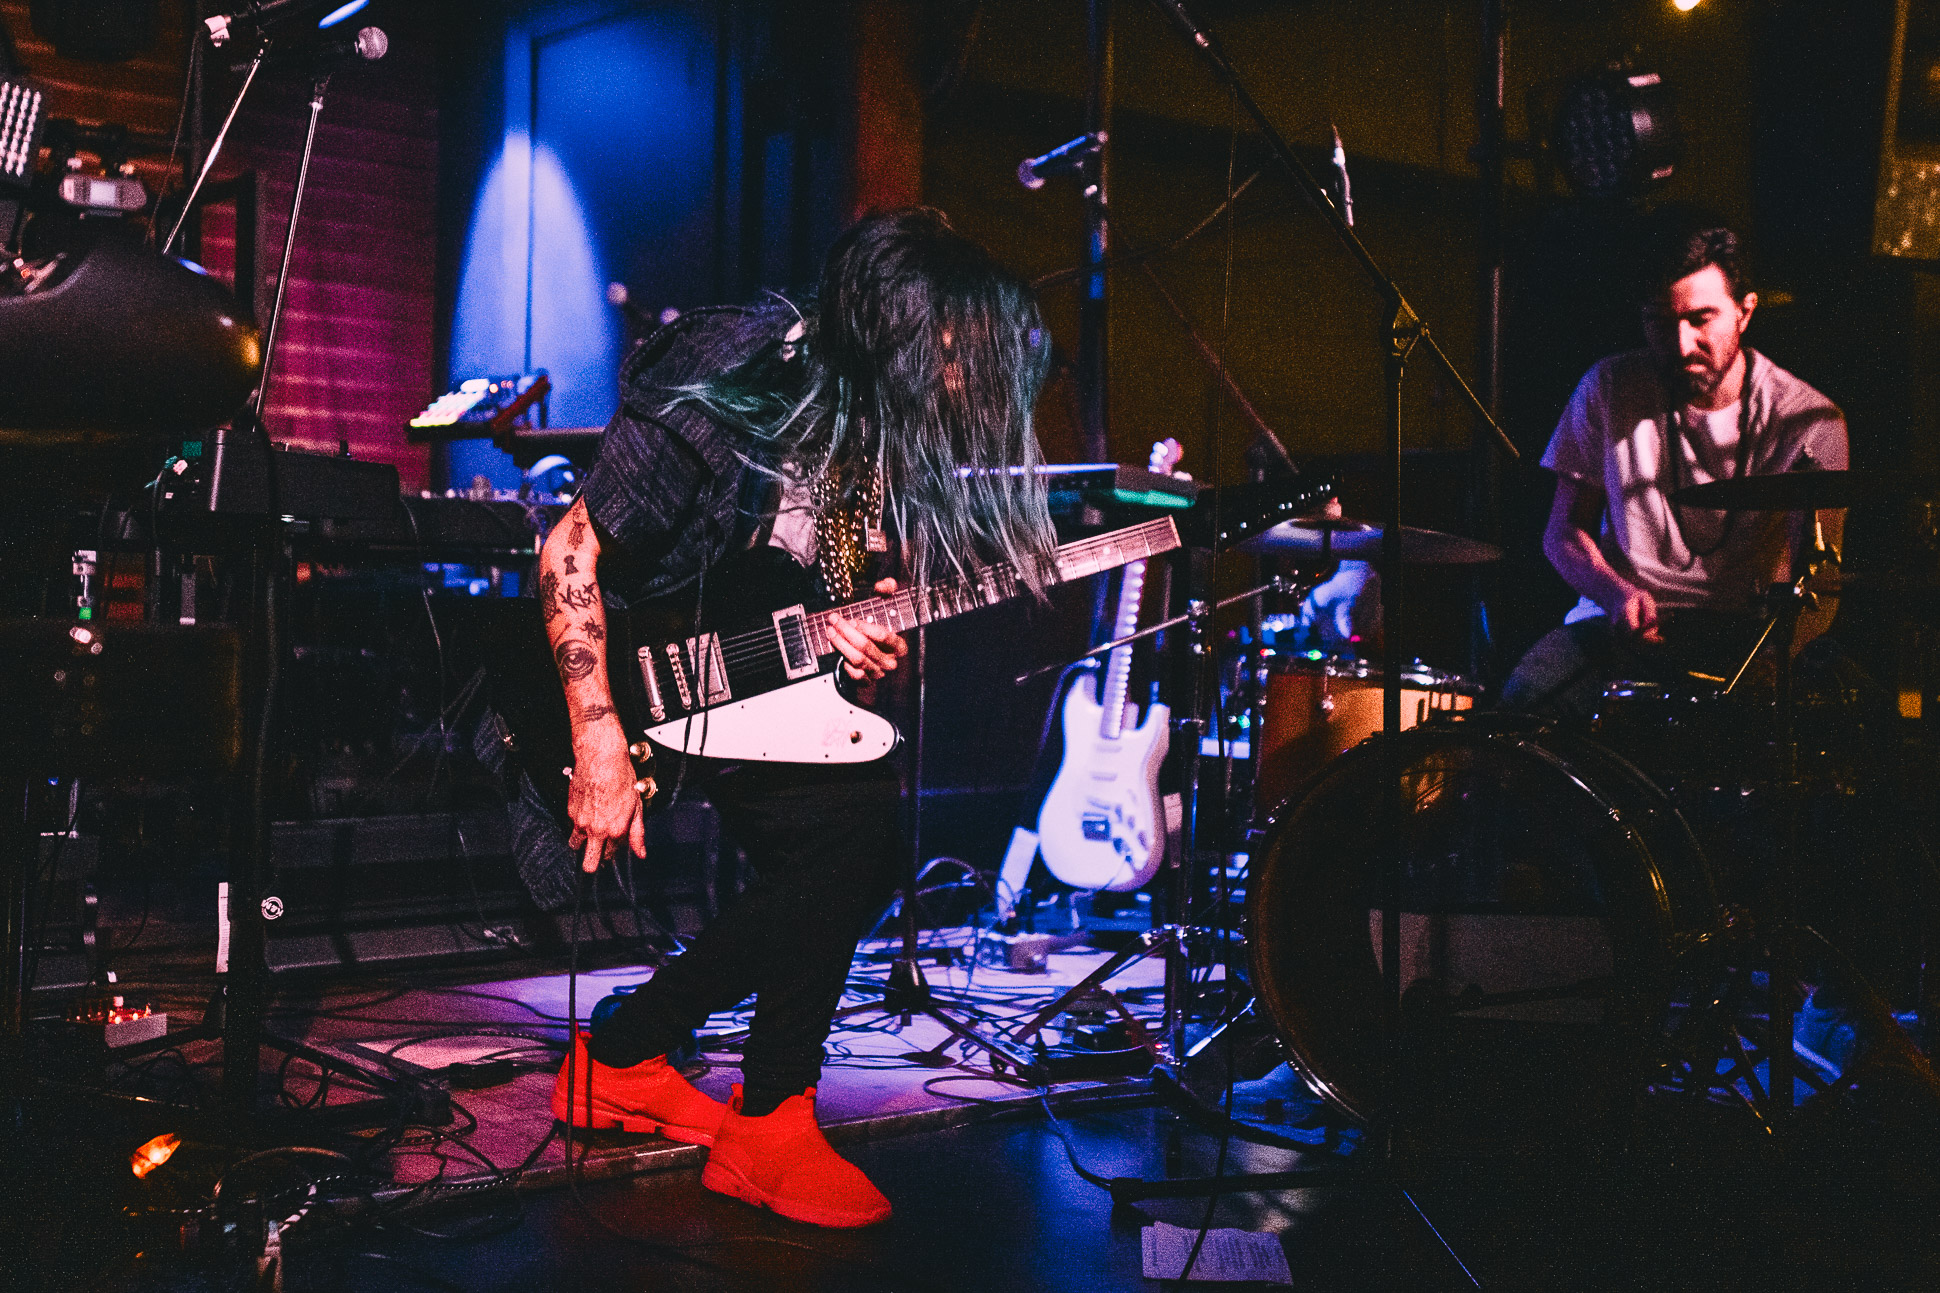 YoungAndSick-FortuneSoundClub-24-01-2019-Vancouver-12.jpg